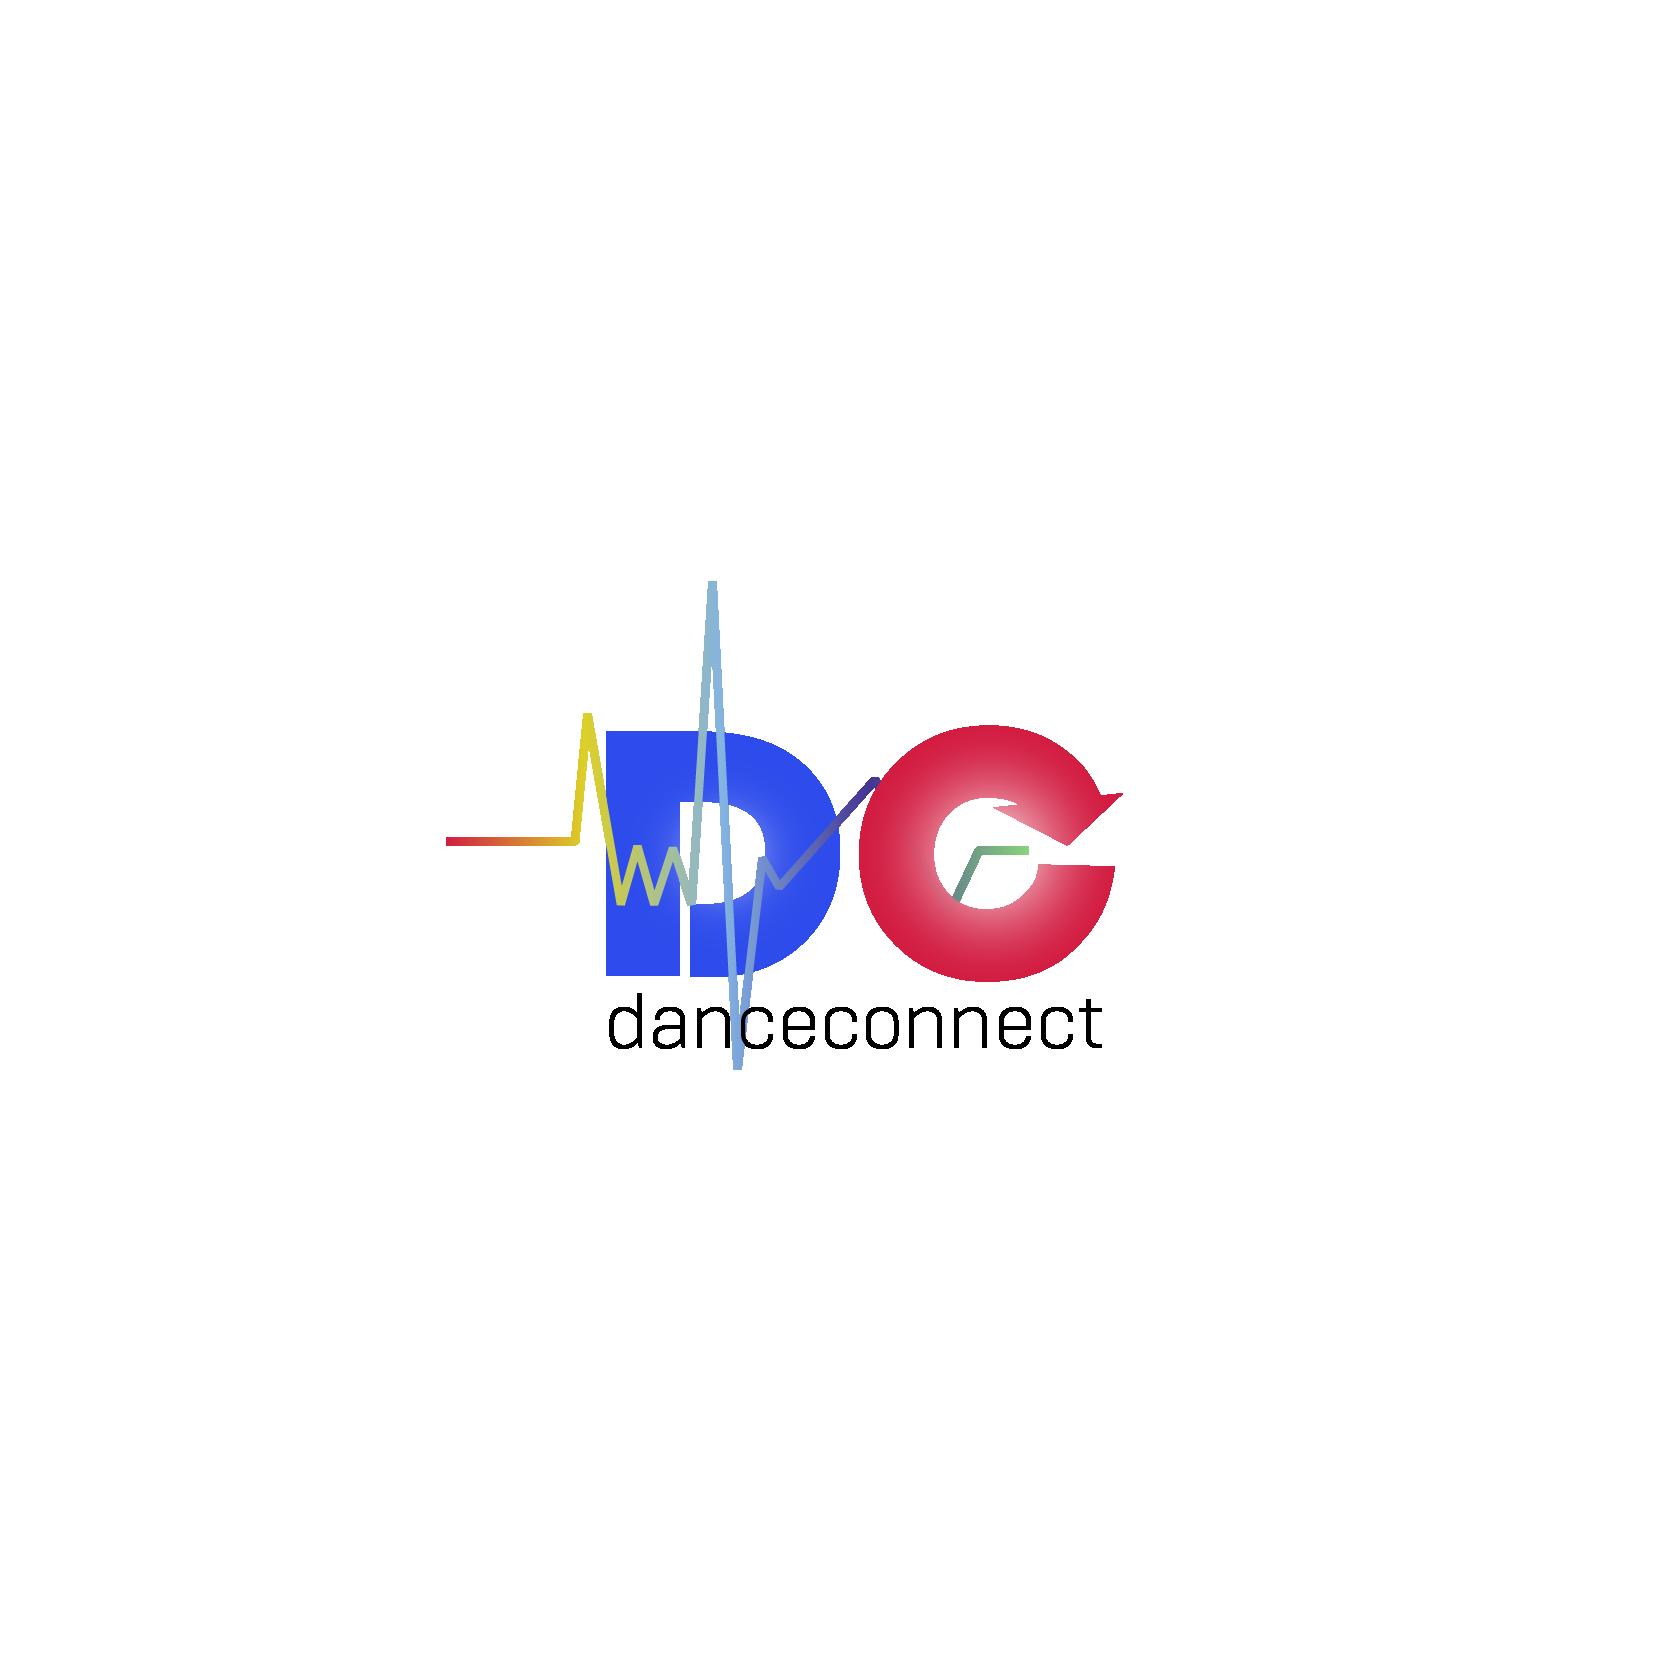 Разработка лого для спортивного портала www.danceconnect.ru фото f_7225b3f4f4b054f5.png